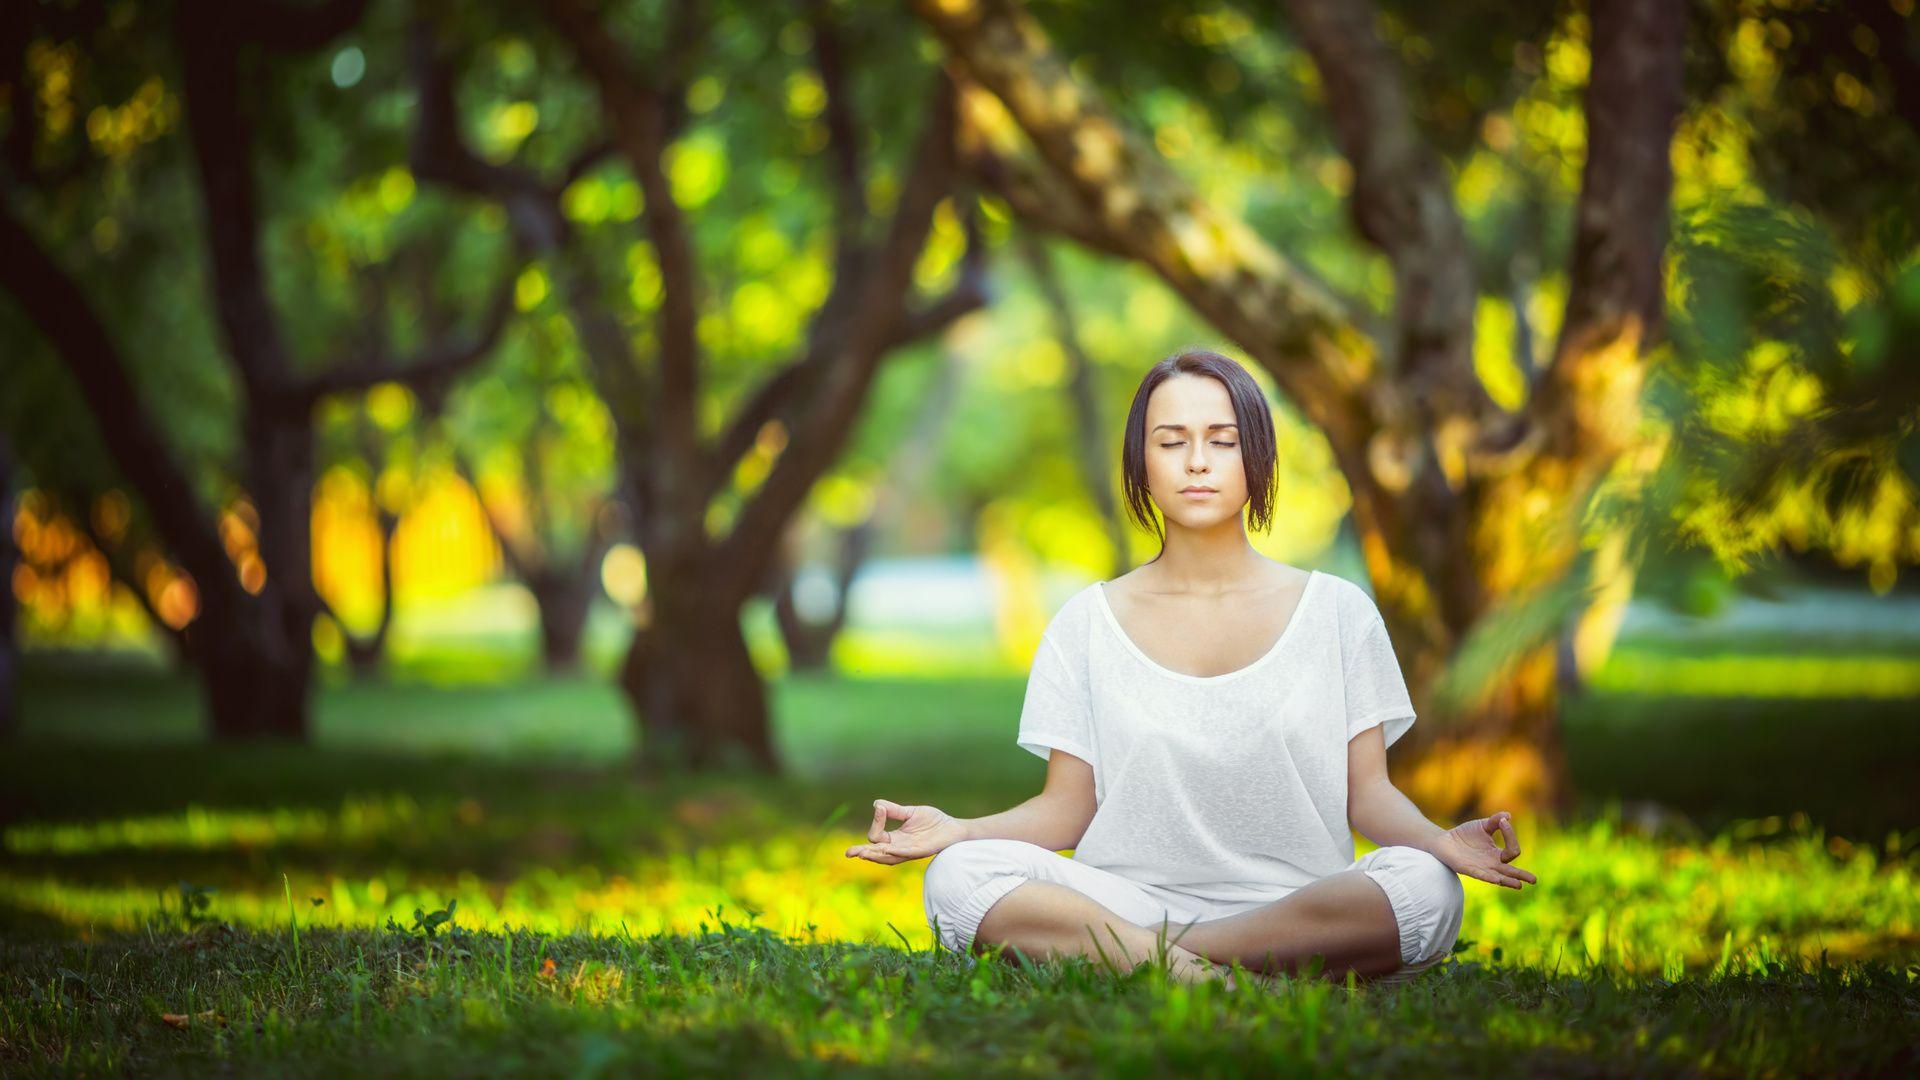 Meditation wallpaper image hd